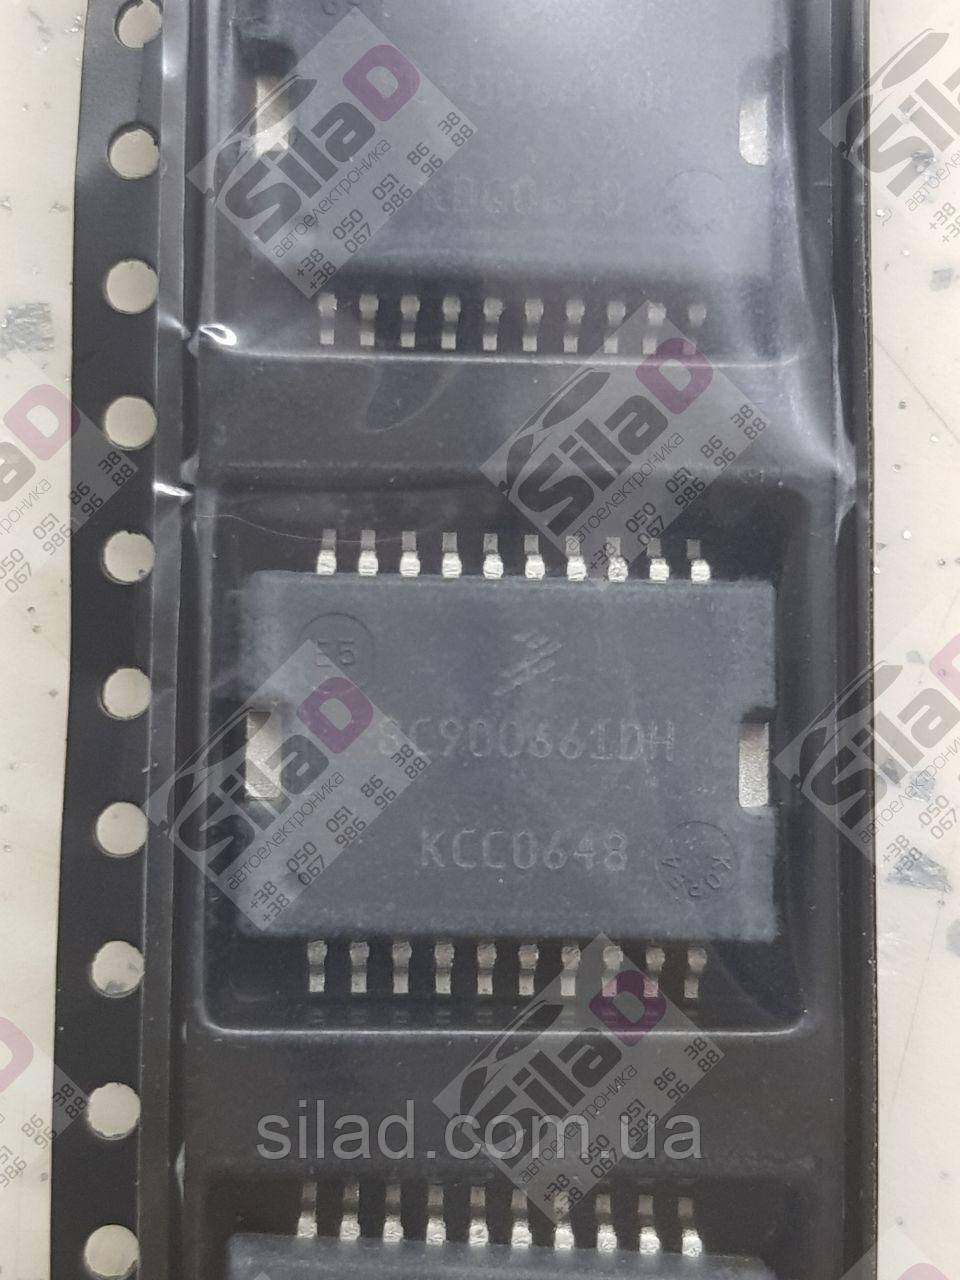 Микросхема SC900661DH Freescale  корпус HSSOP-20